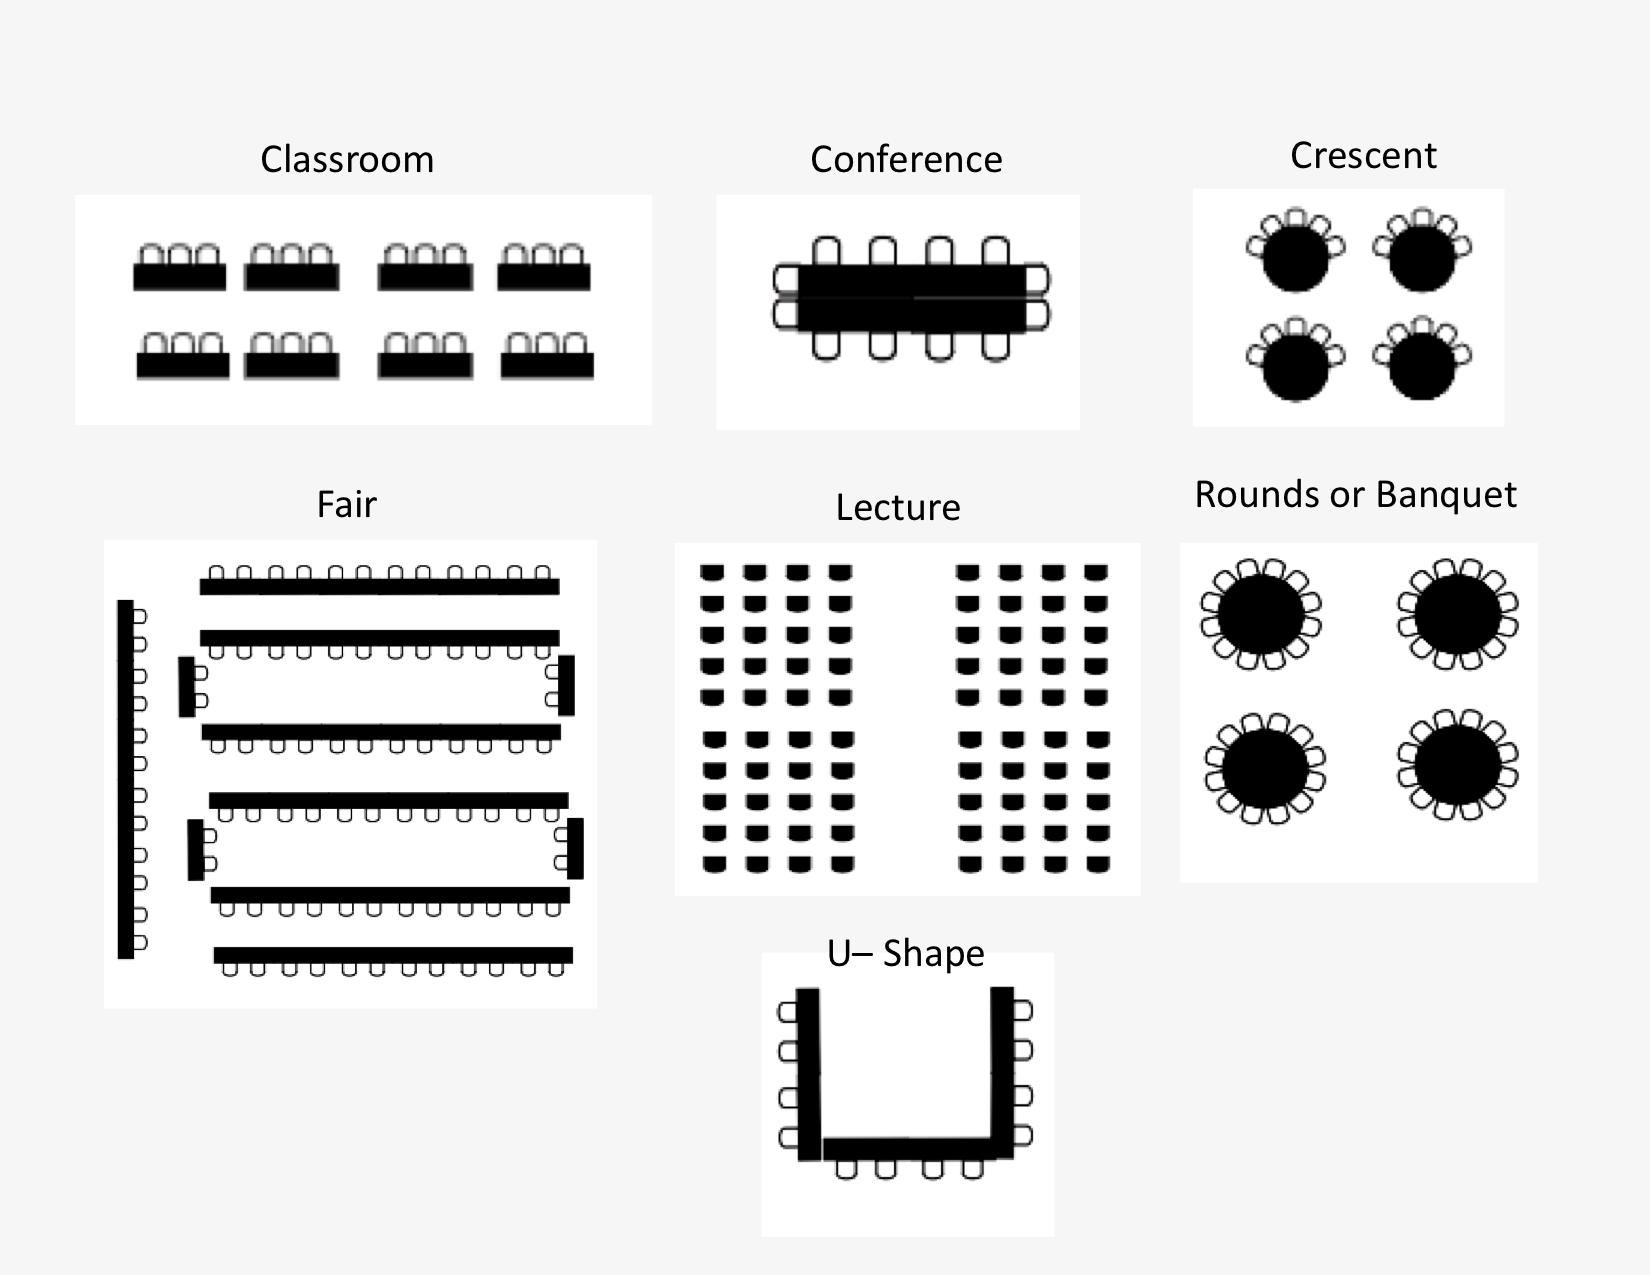 Room Set Up Types